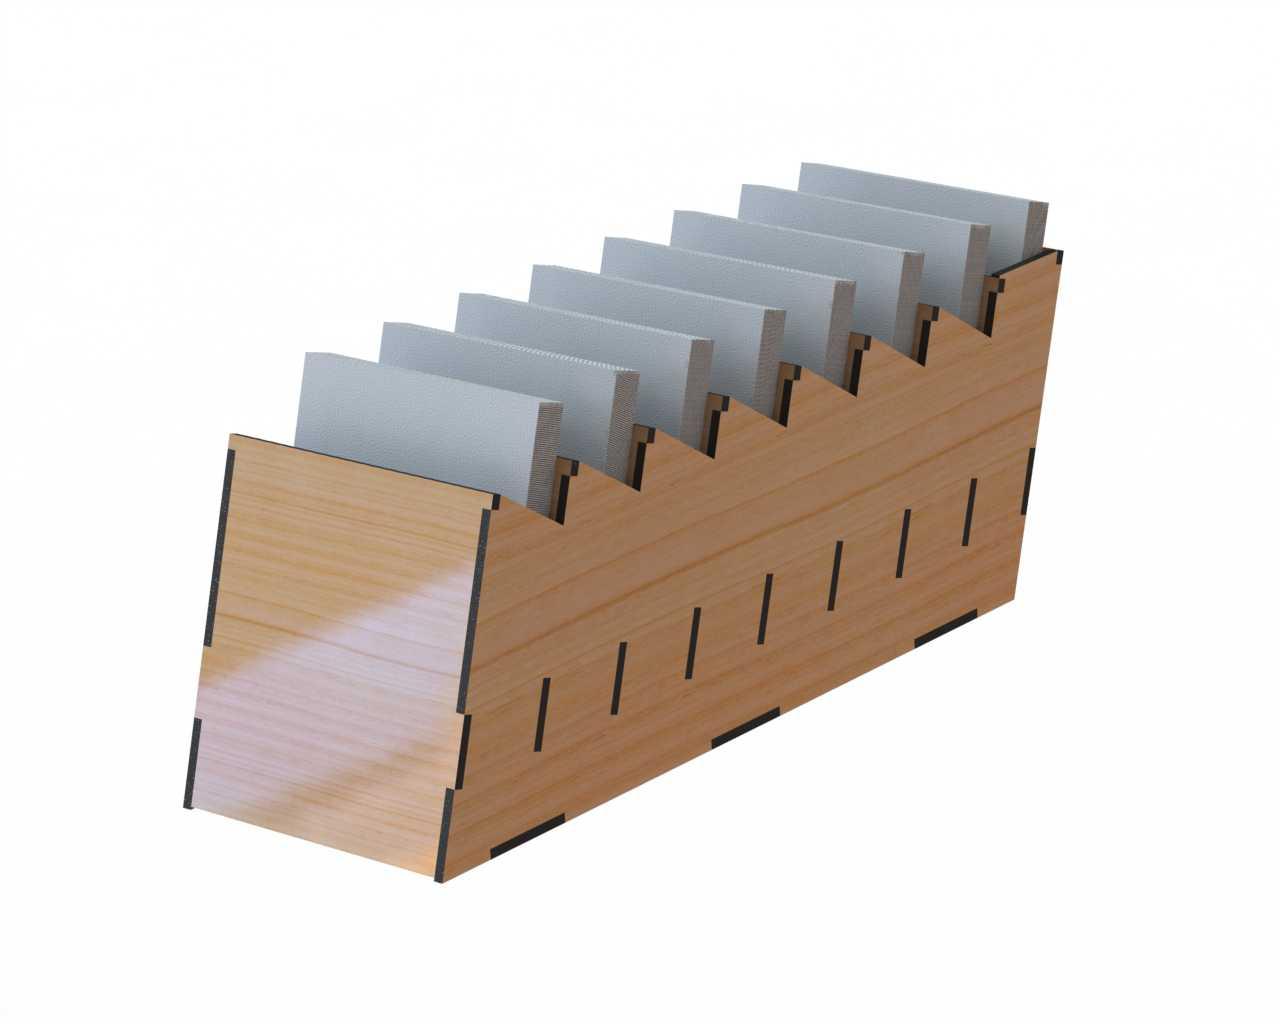 Laser Cut Desk Organizer for Notes DXF File